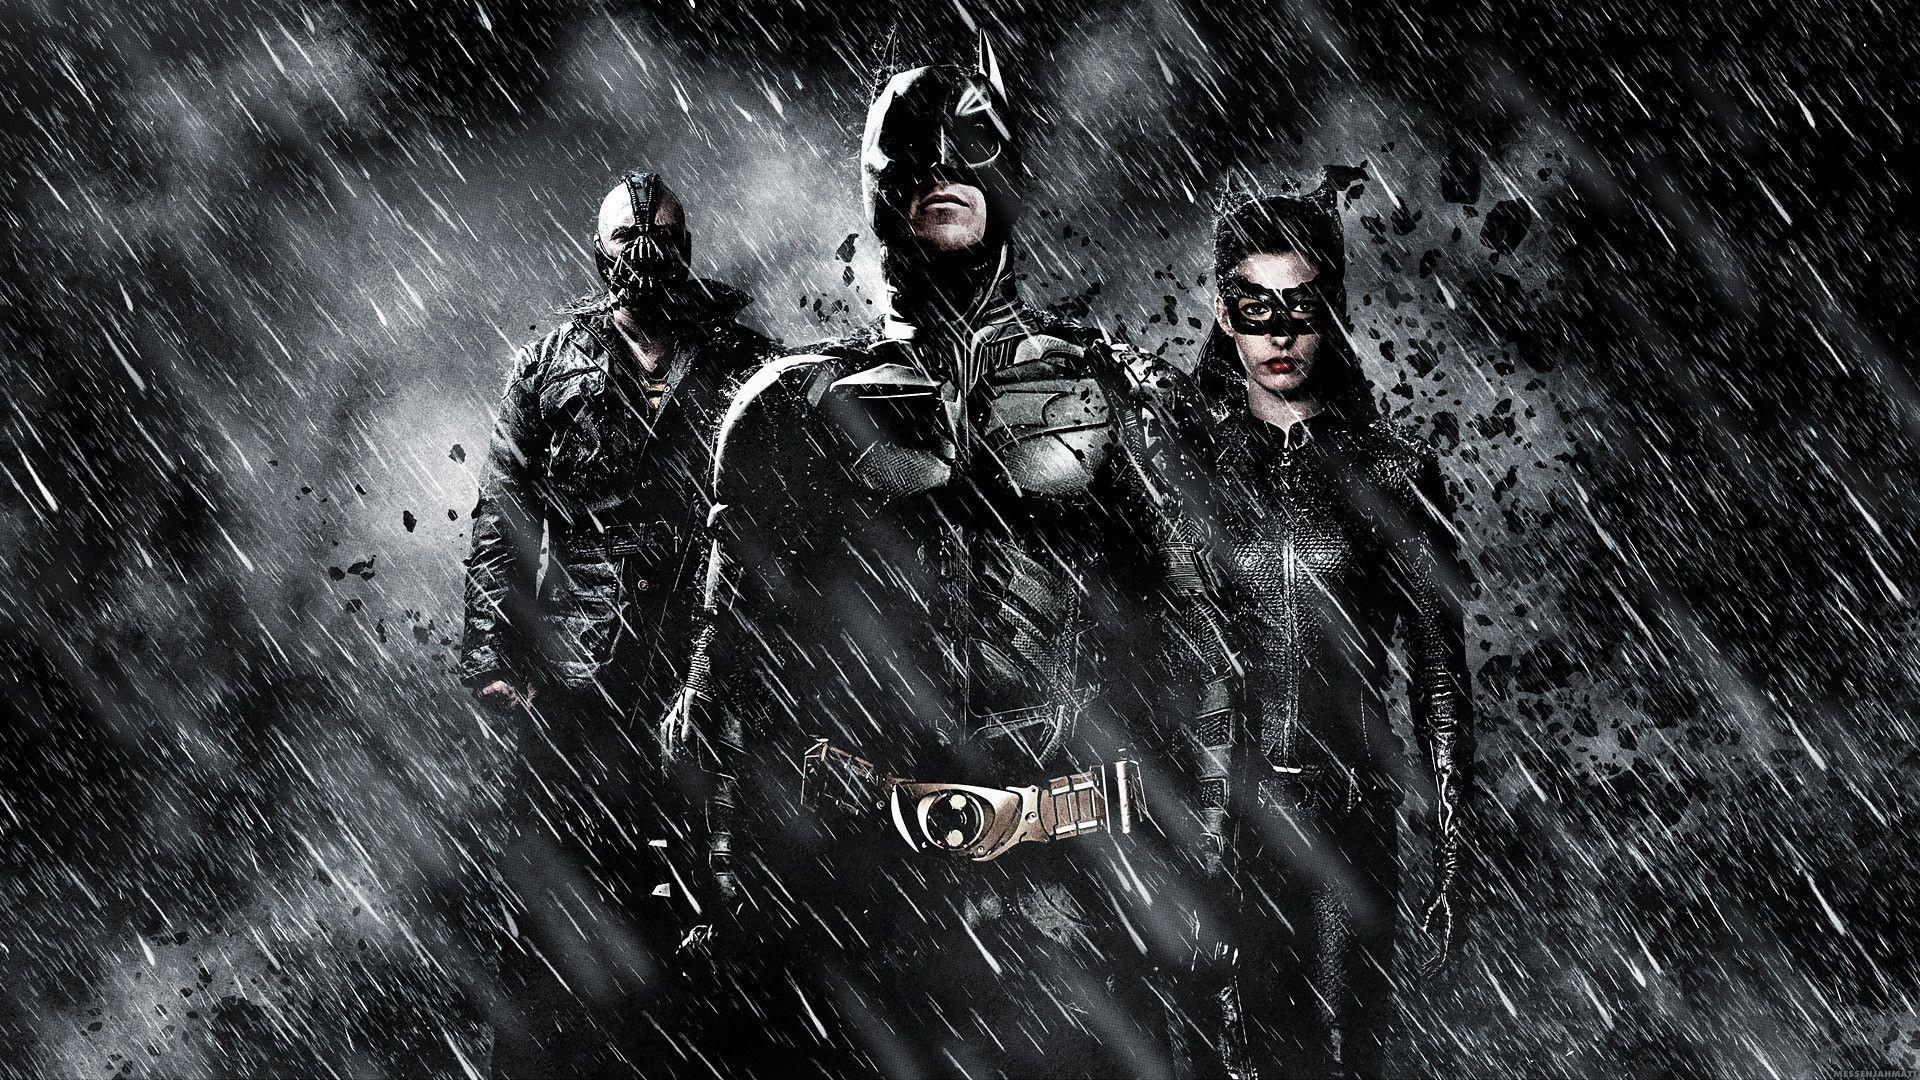 Batman The Dark Knight Rises Hd Clipart – ClipartFox | Batman The